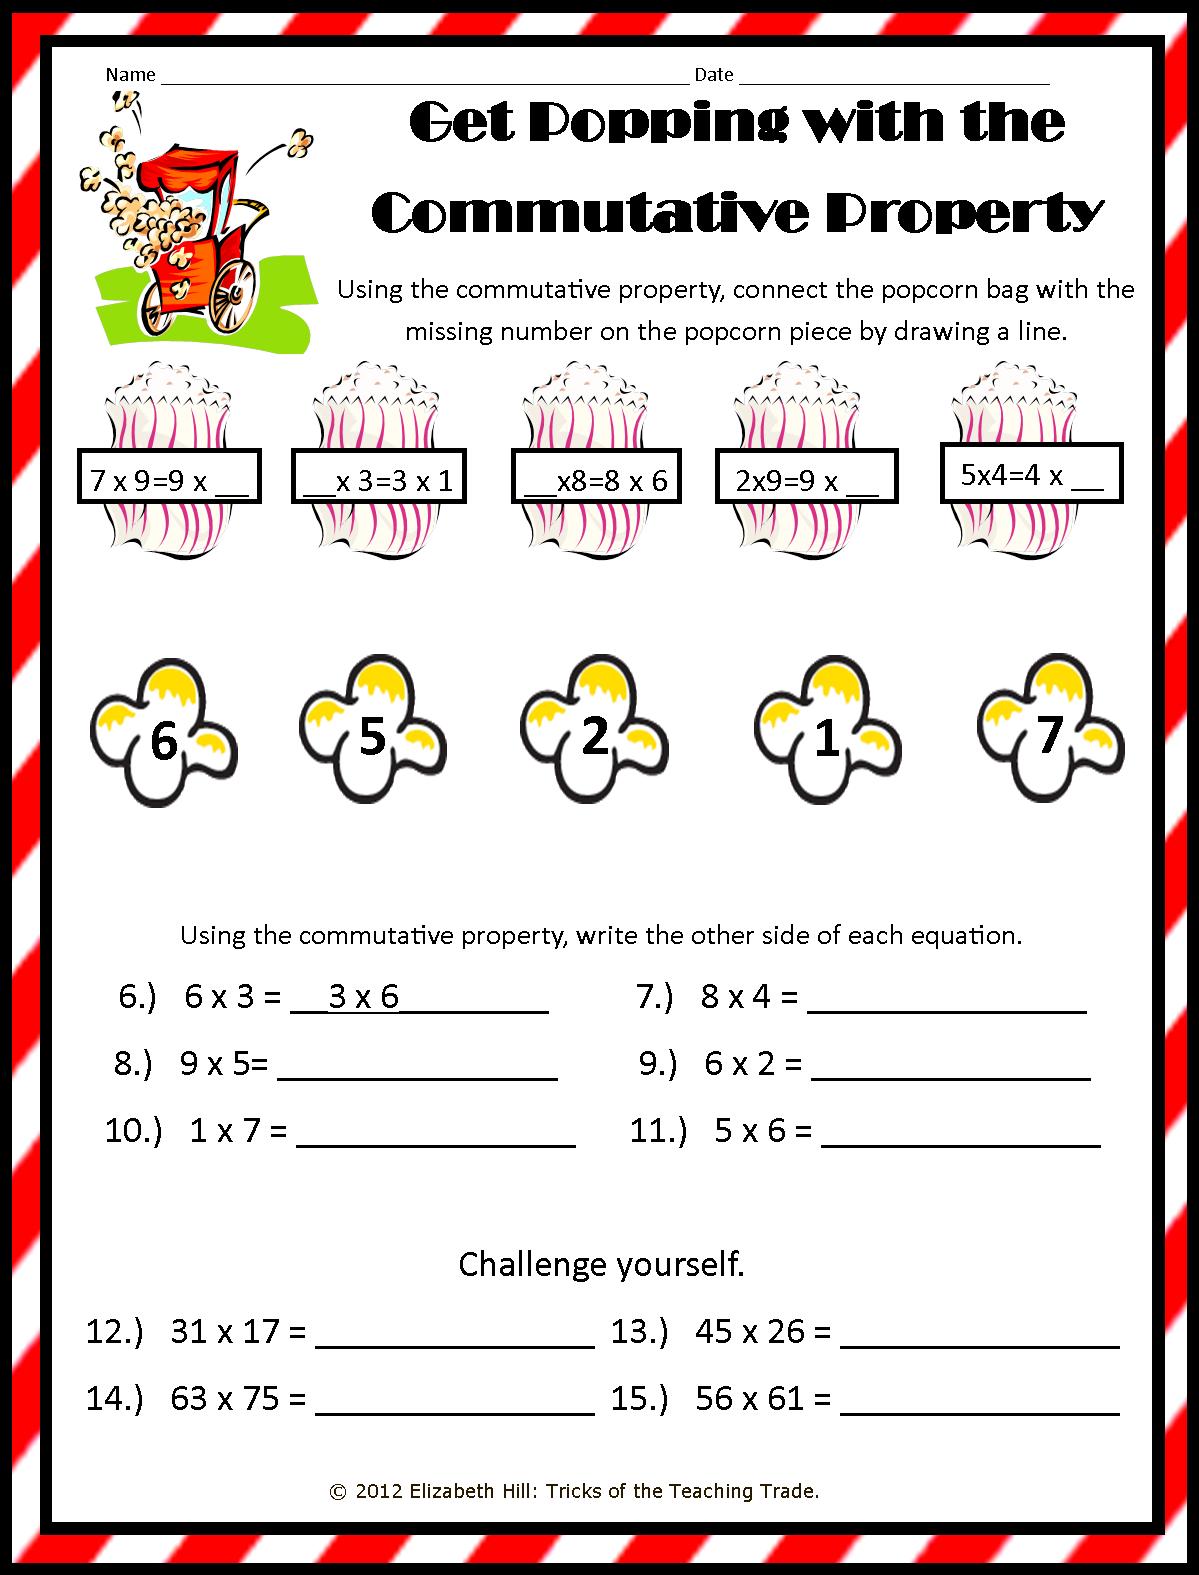 35 Commutative Property Multiplication Worksheet - Worksheet Resource Plans [ 1575 x 1199 Pixel ]